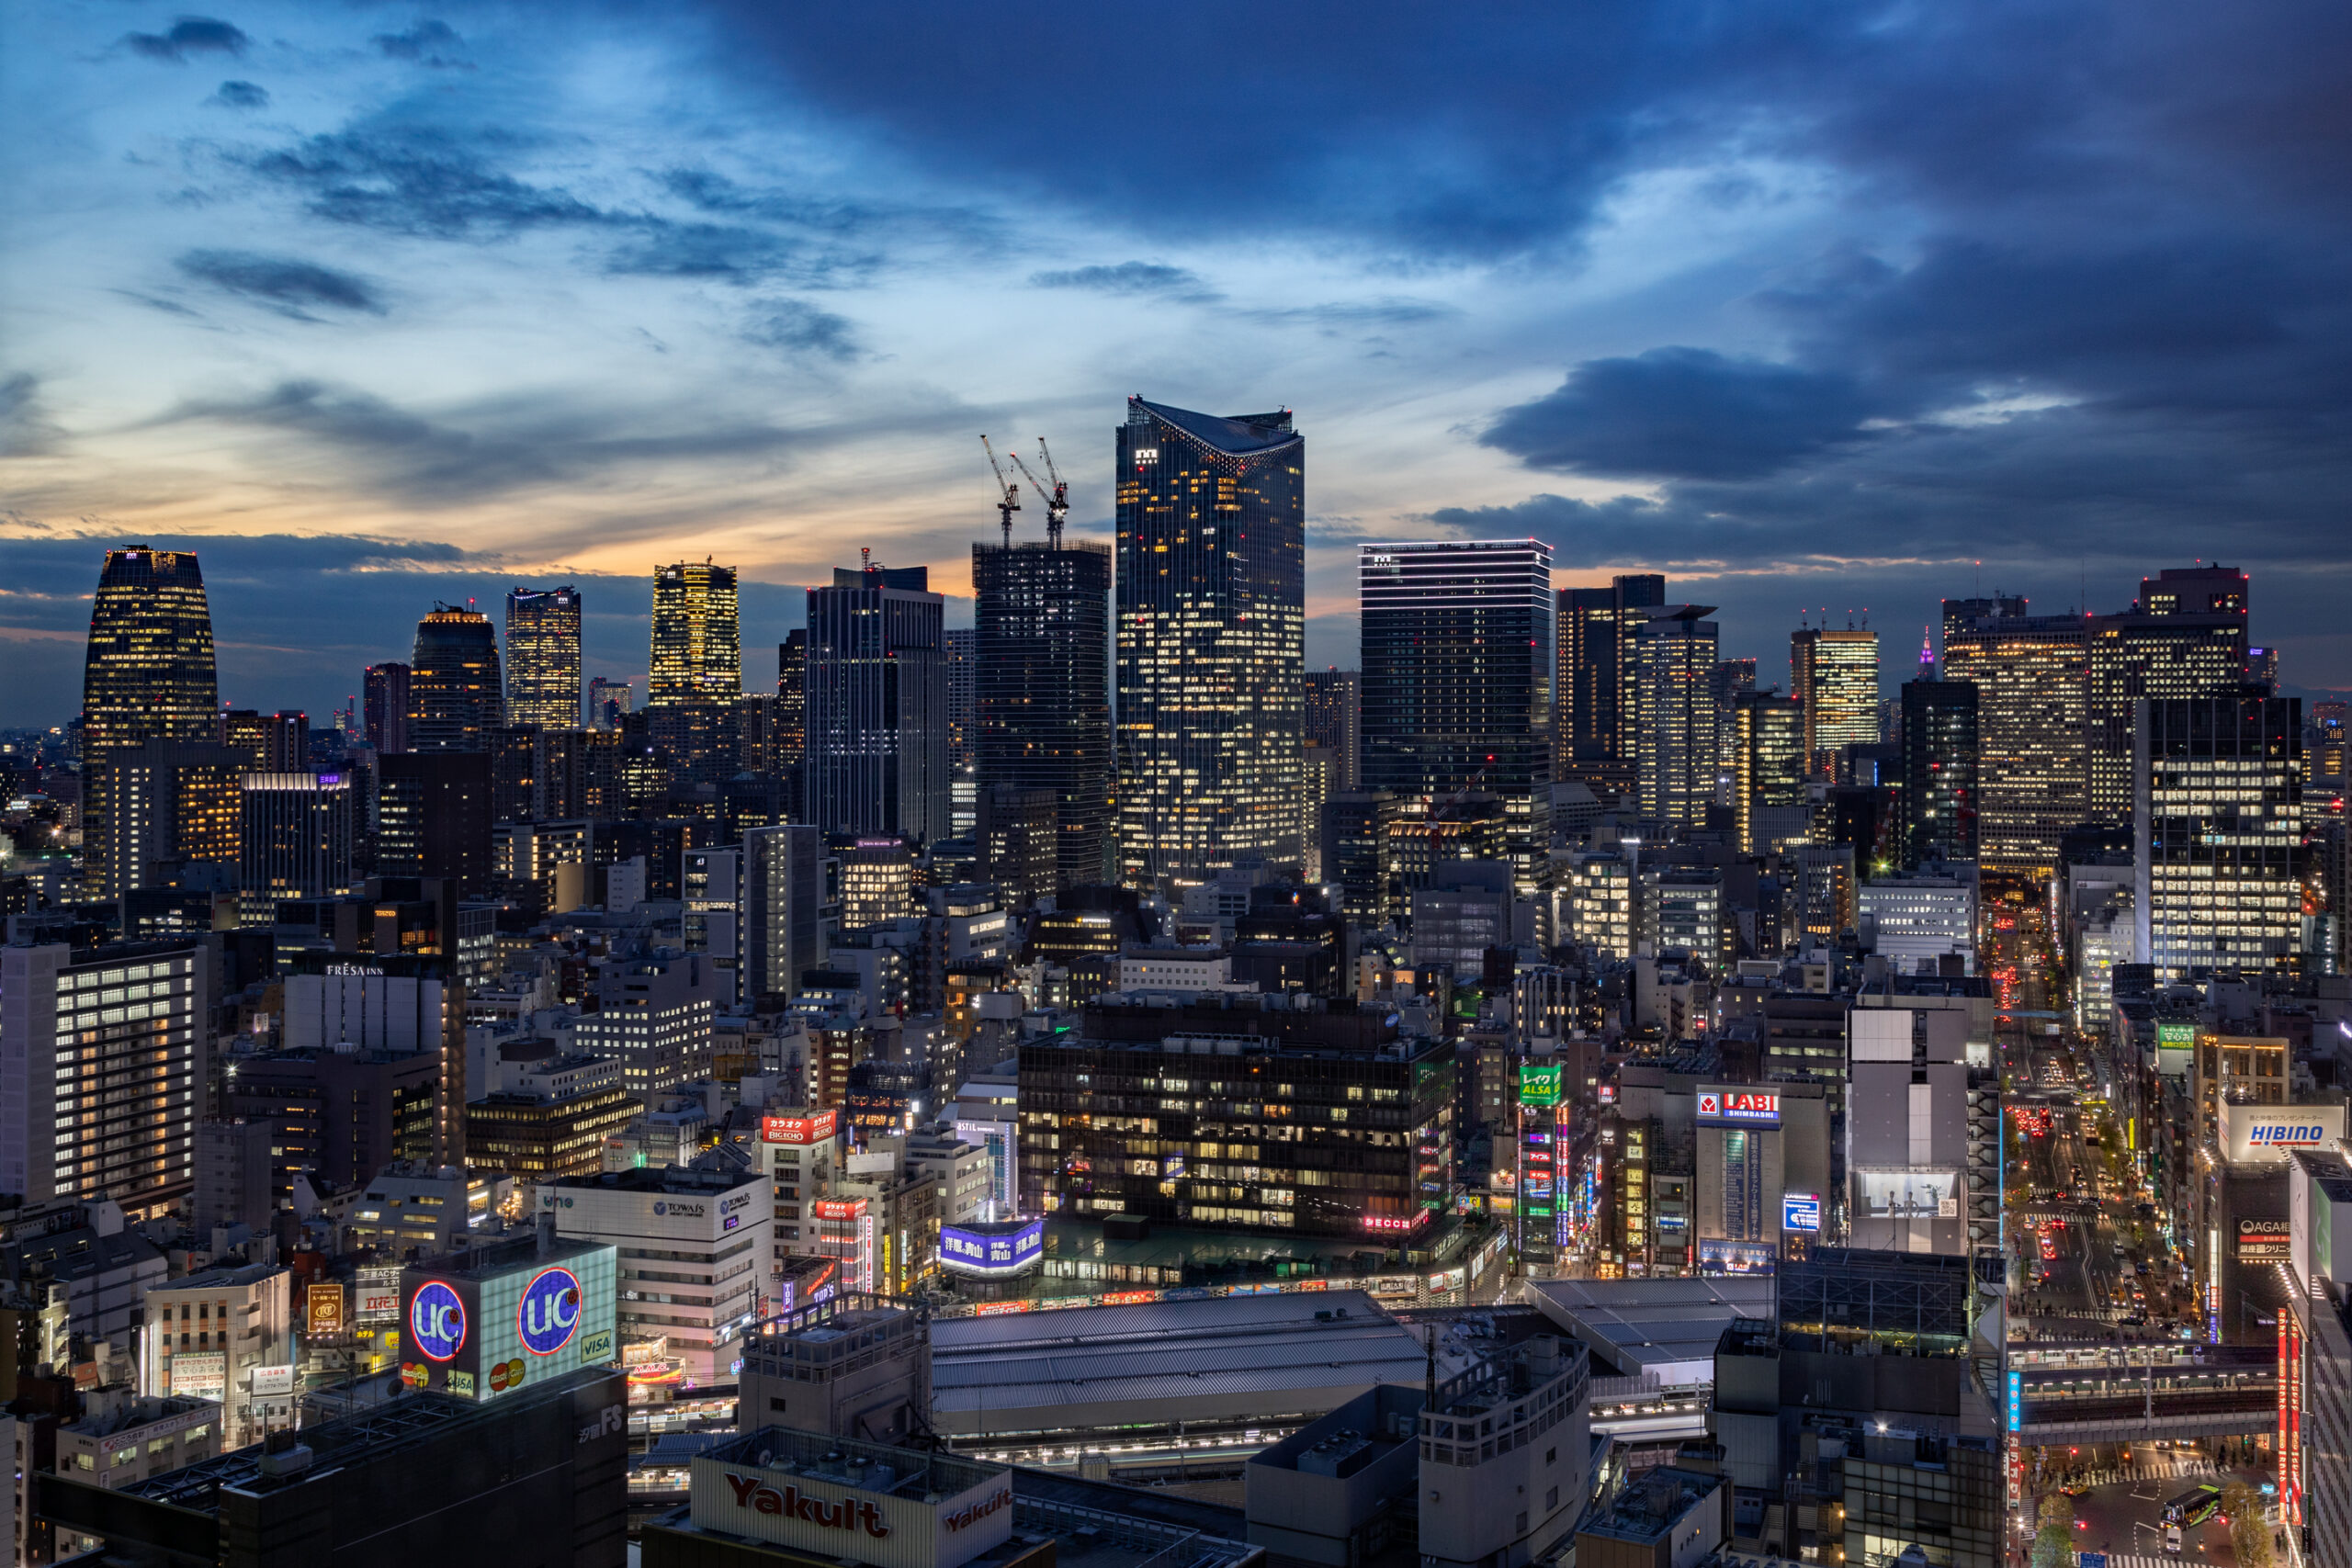 Ingenhoven Toranomon Tower Tokio